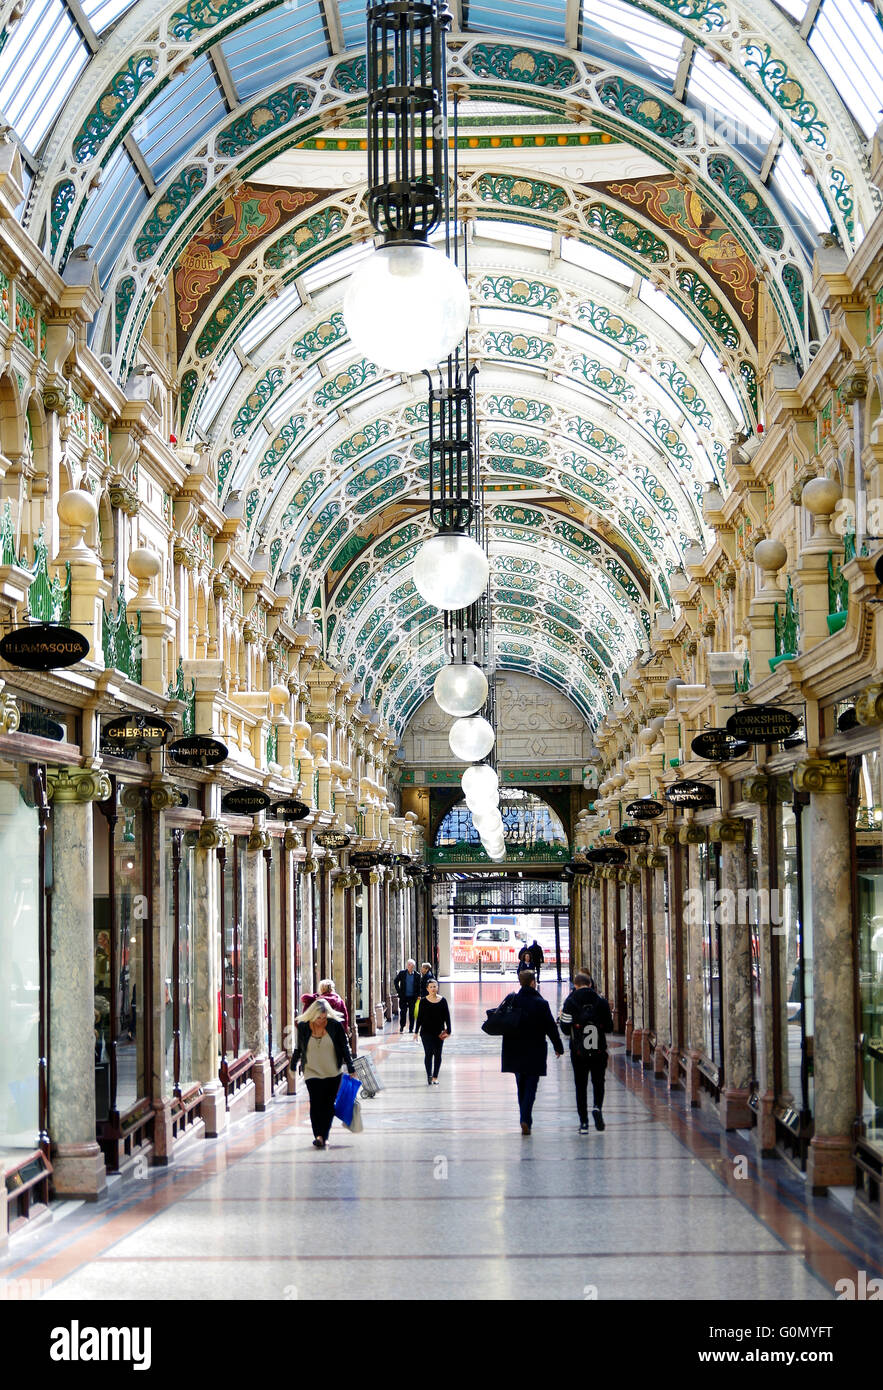 County Arcade Victoria Quarter Leeds Frank Matcham - Stock Image